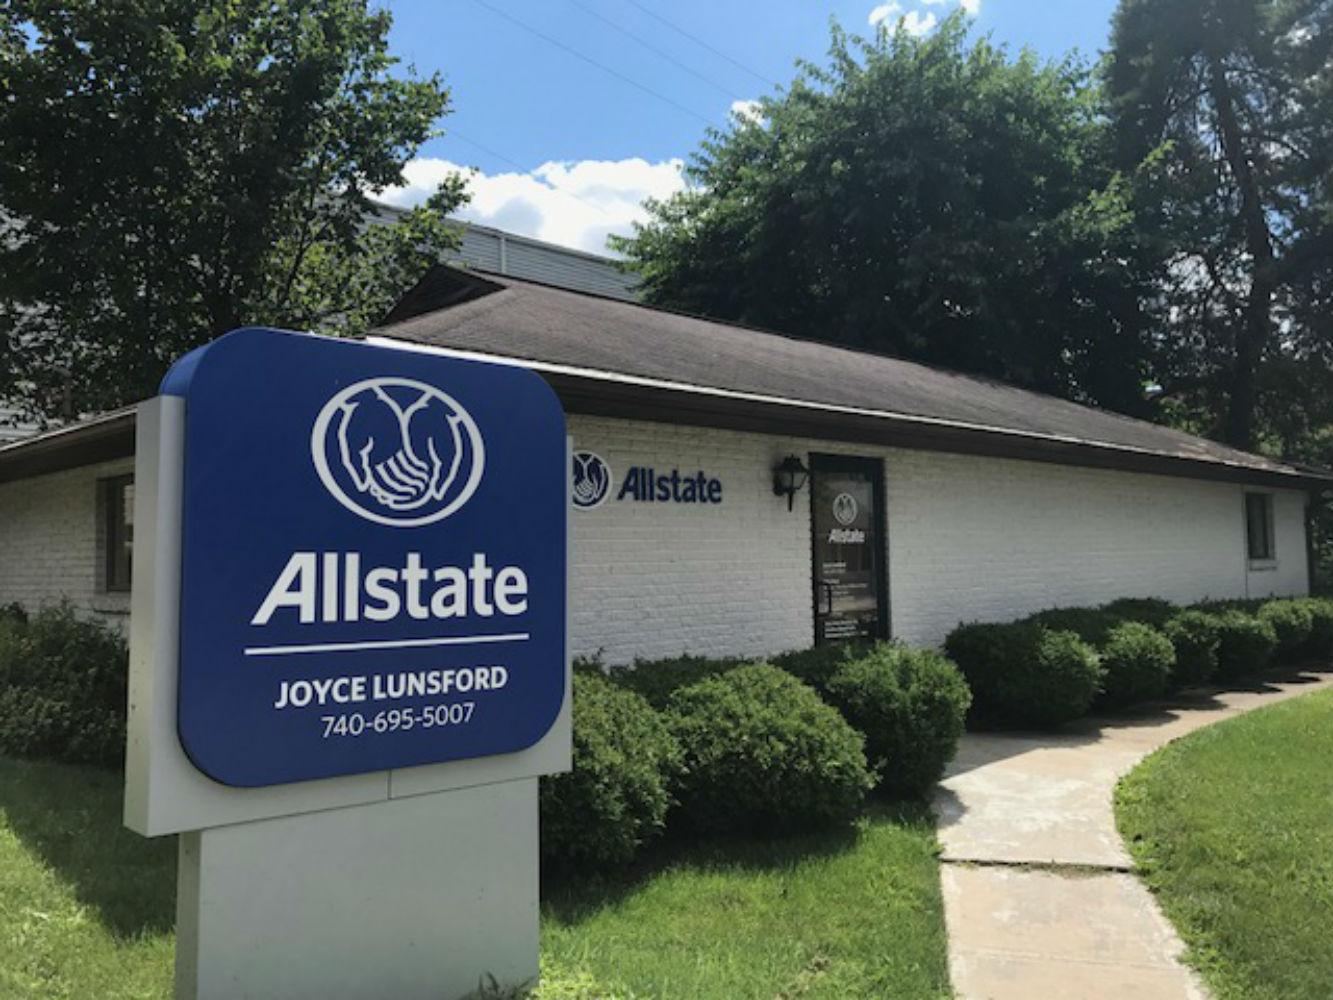 Joyce Lunsford: Allstate Insurance image 2